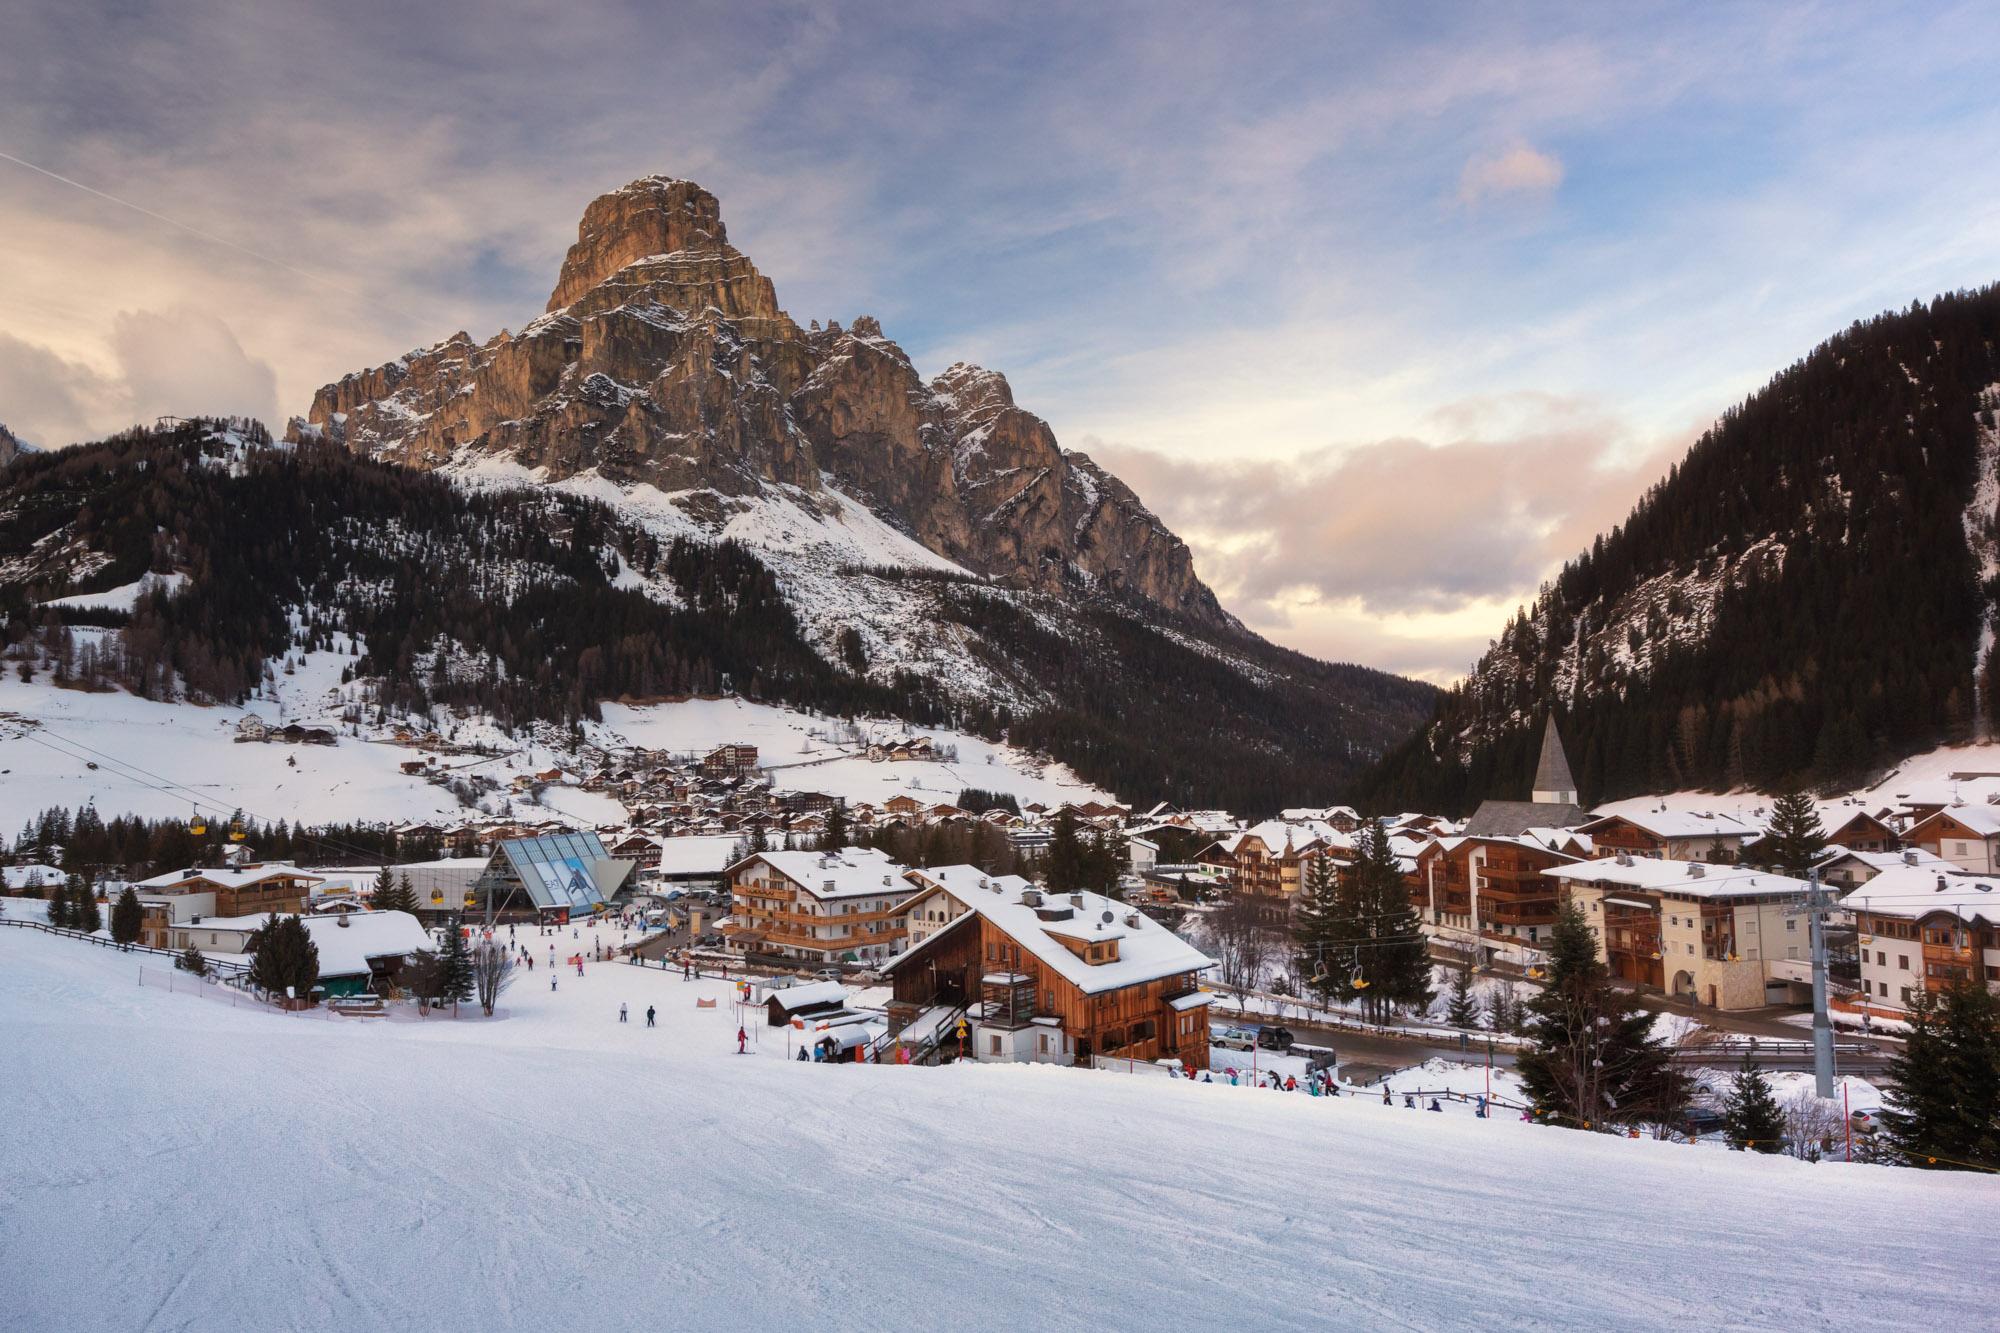 Ski Resort of Corvara, Alta Badia, Italy